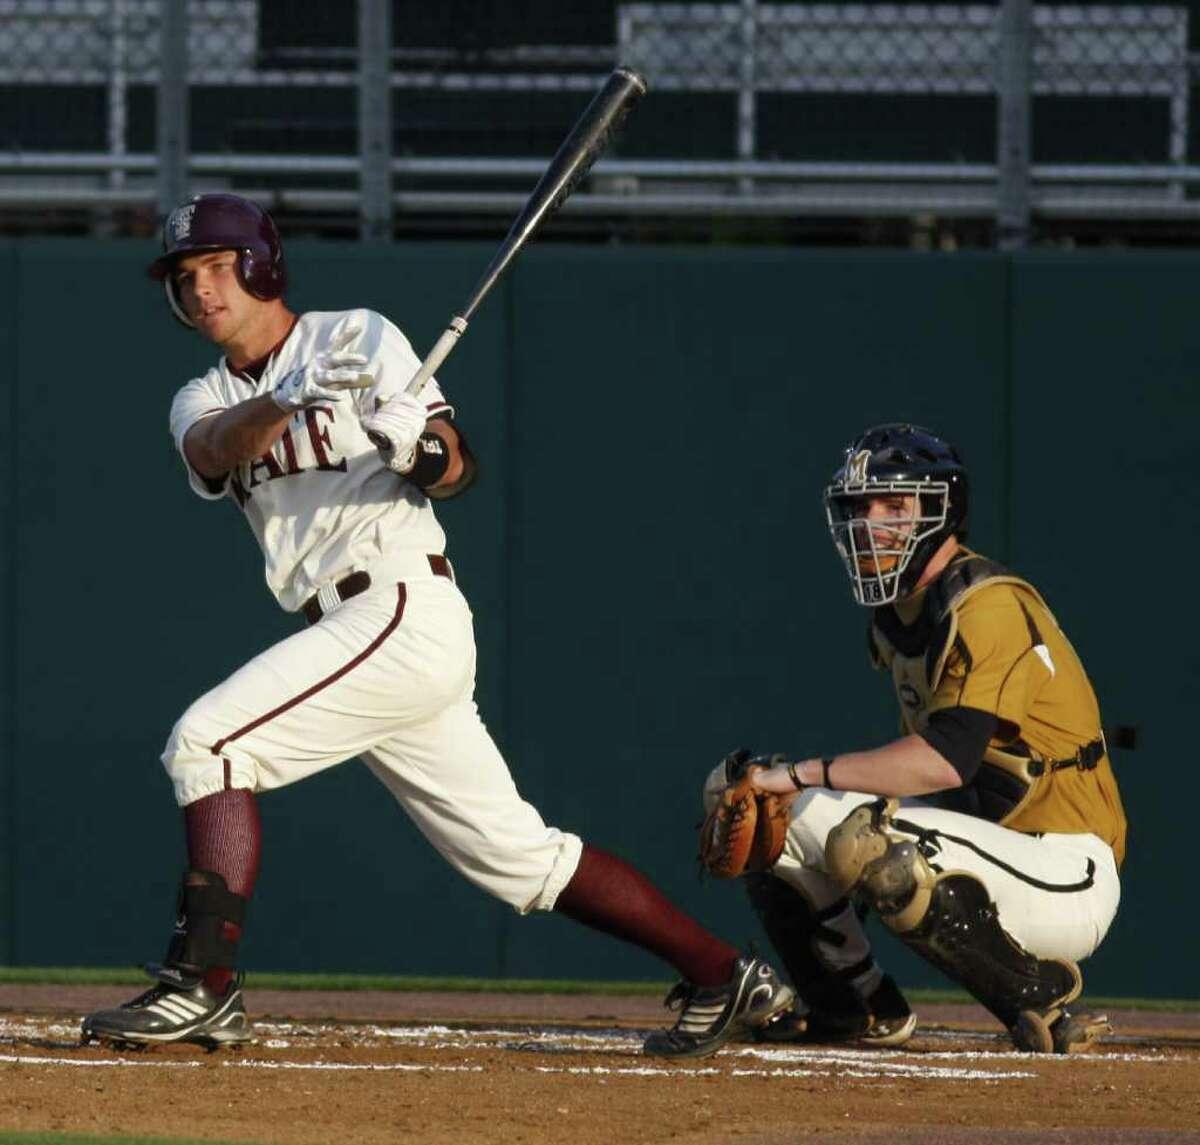 Texas State baseball player Casey (Ory) Kalenkosky in 2011 baseball action vs. Missouri.